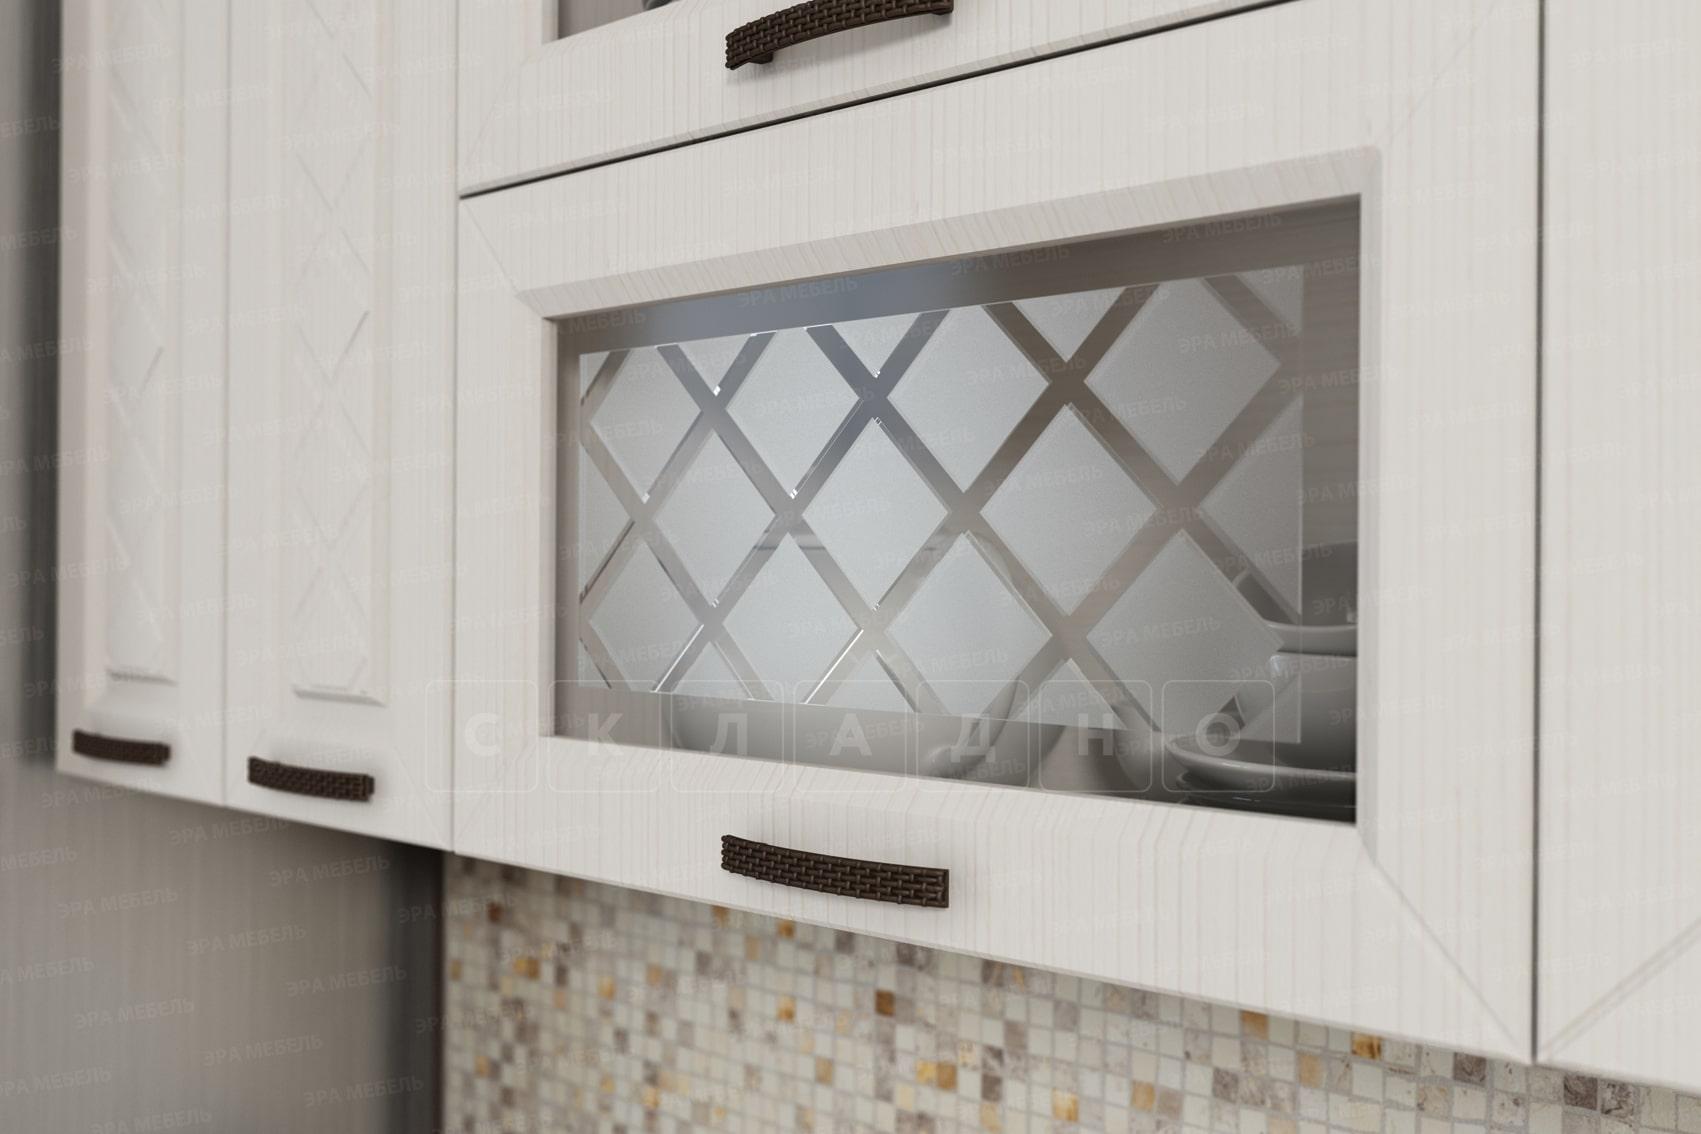 Кухня угловая с пеналом Агава 1,45х2,75м фото 6 | интернет-магазин Складно